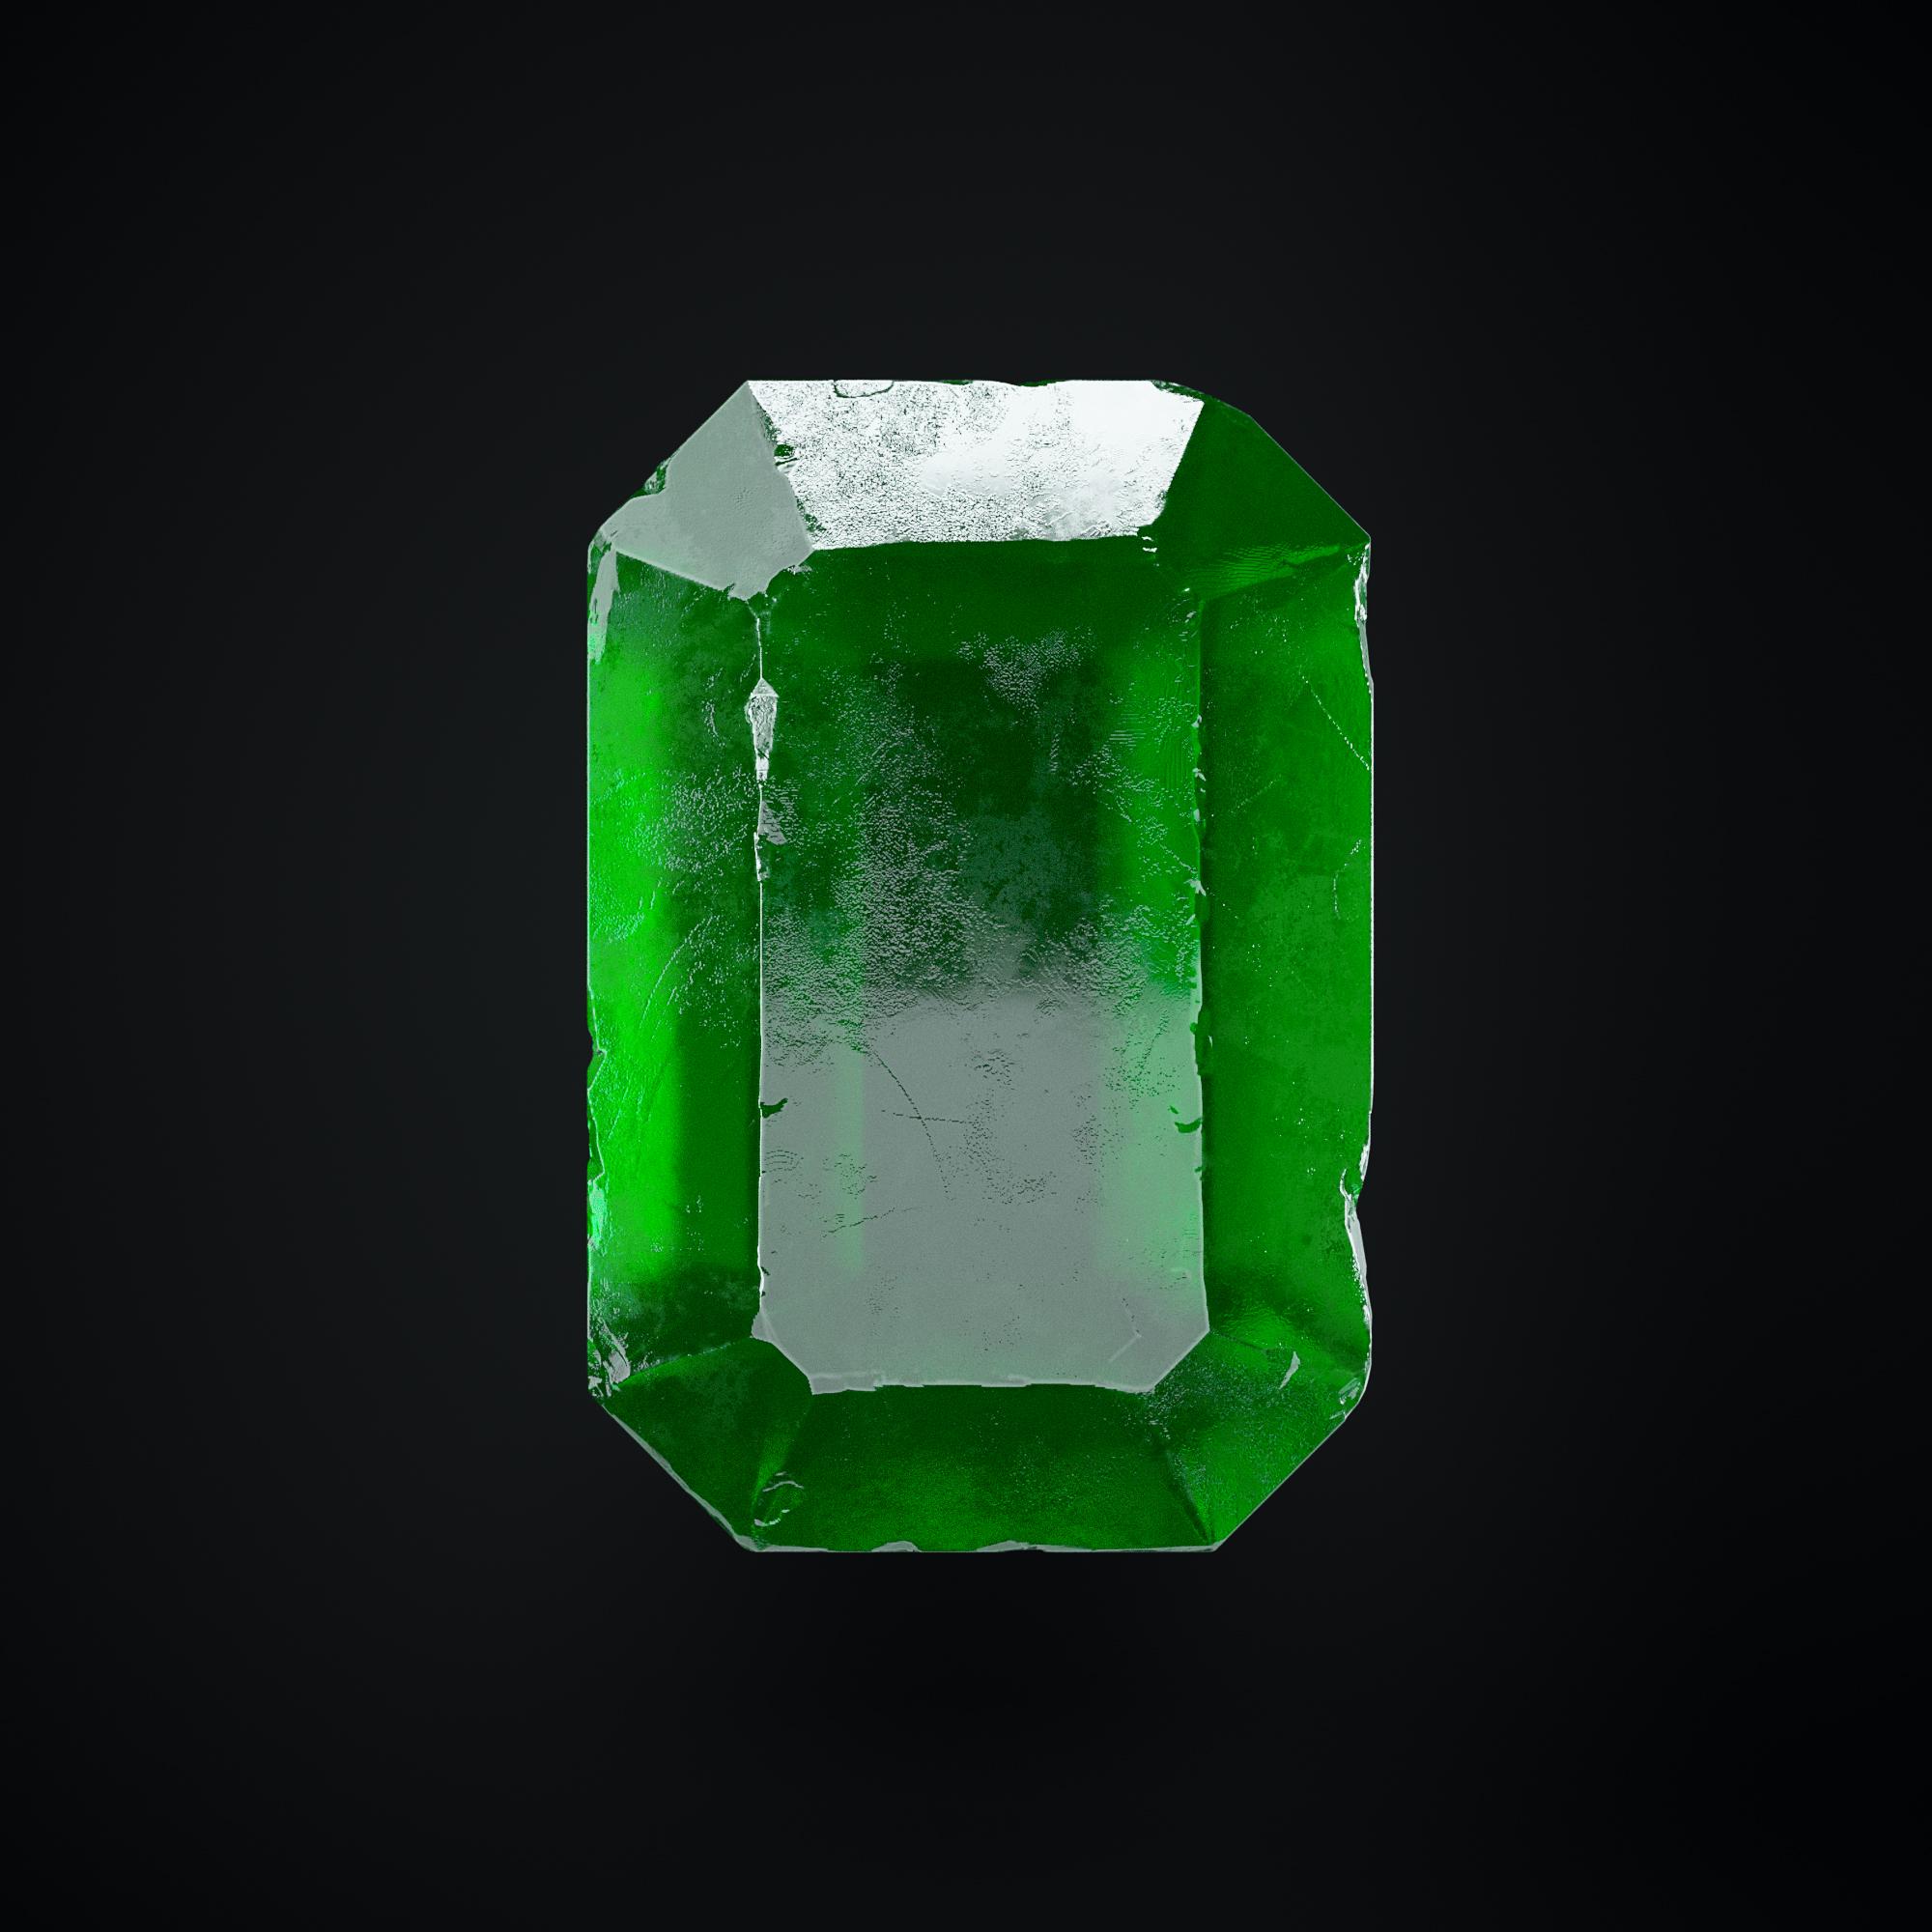 Emerald_frontal.jpg